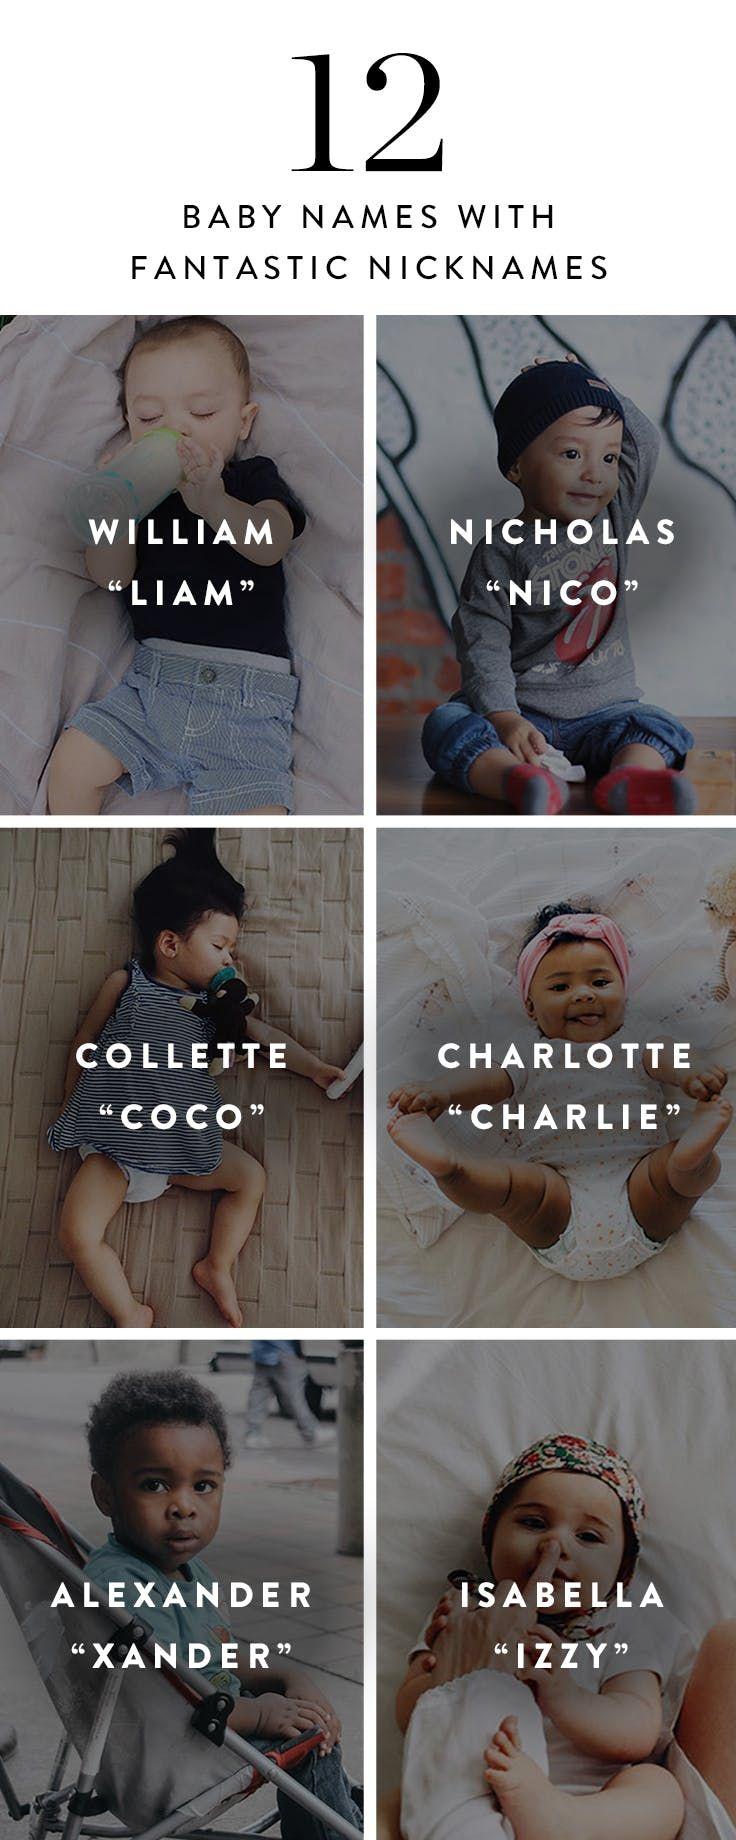 12 Baby Names with Fantastic Nicknames via @PureWow